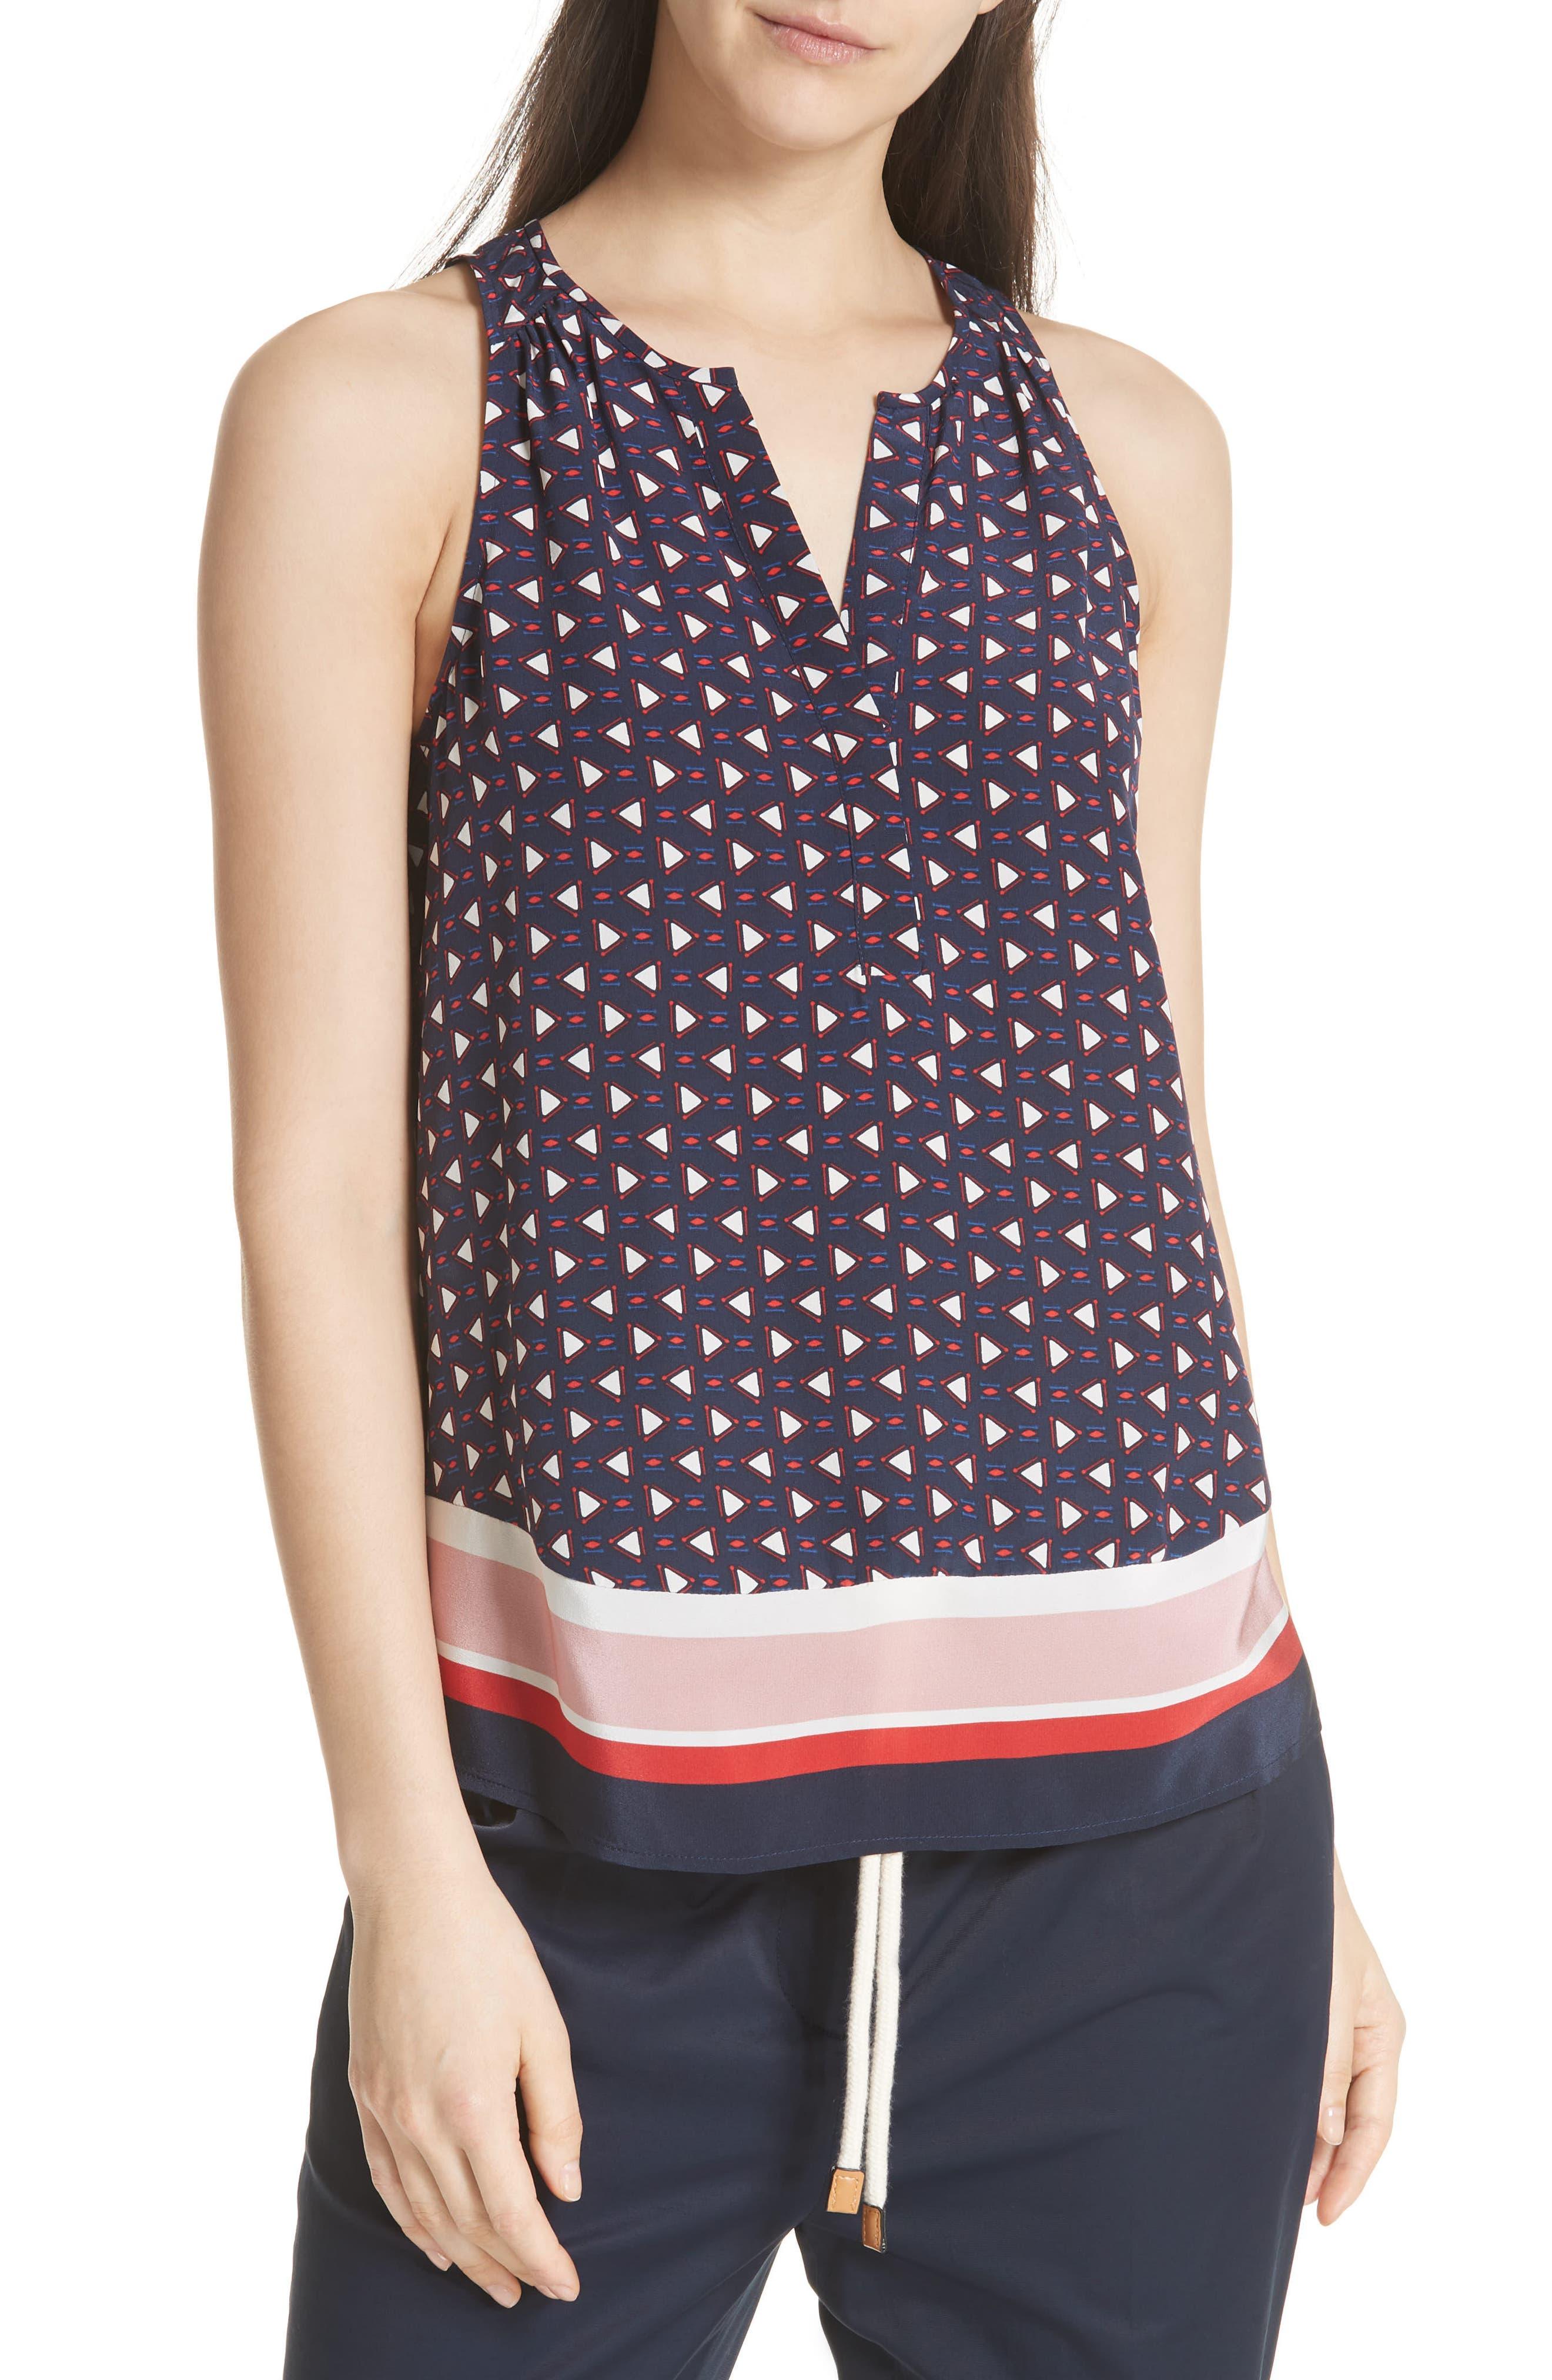 Xandry B Silk Top,                         Main,                         color, 410